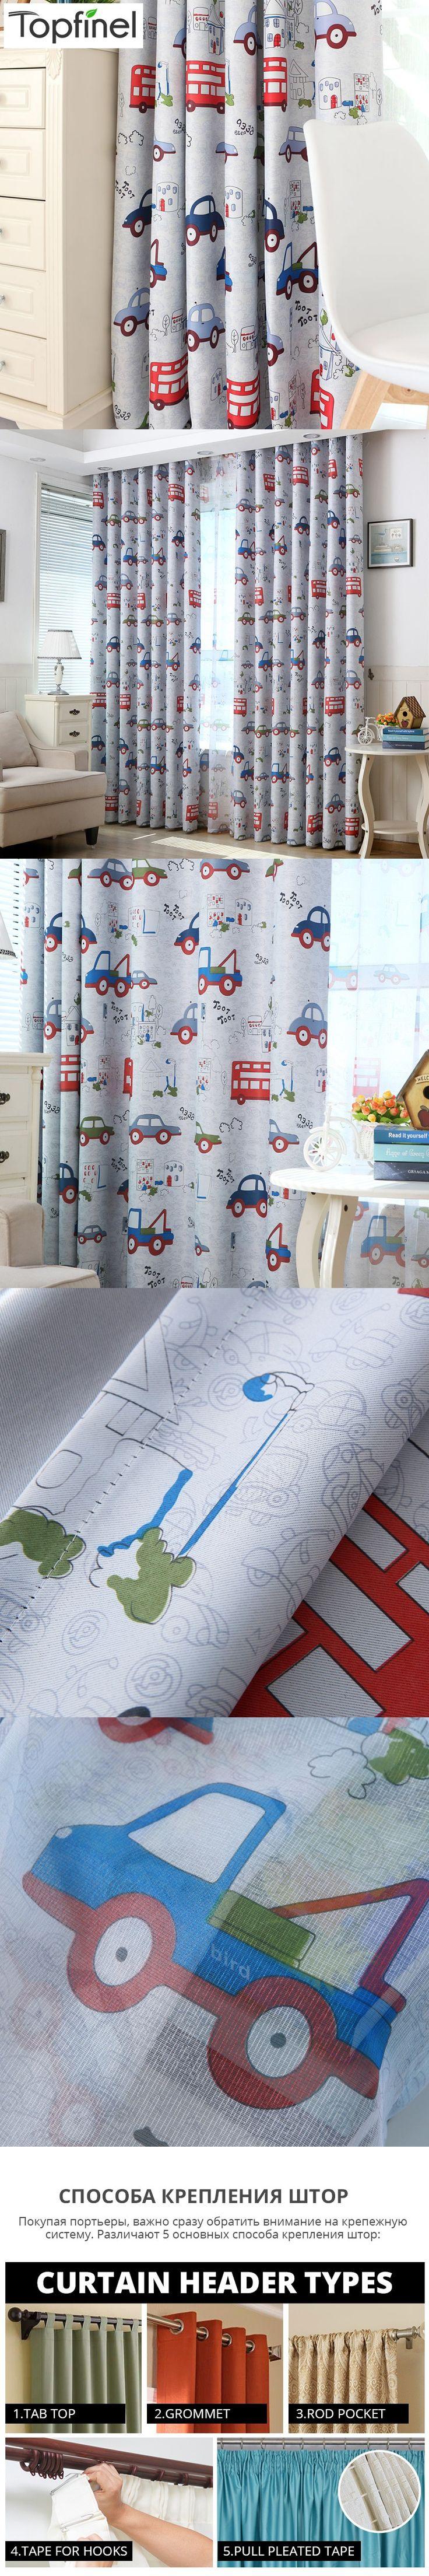 Best 20 curtains for kids ideas on pinterest curtains - Curtain ideas for kids room ...